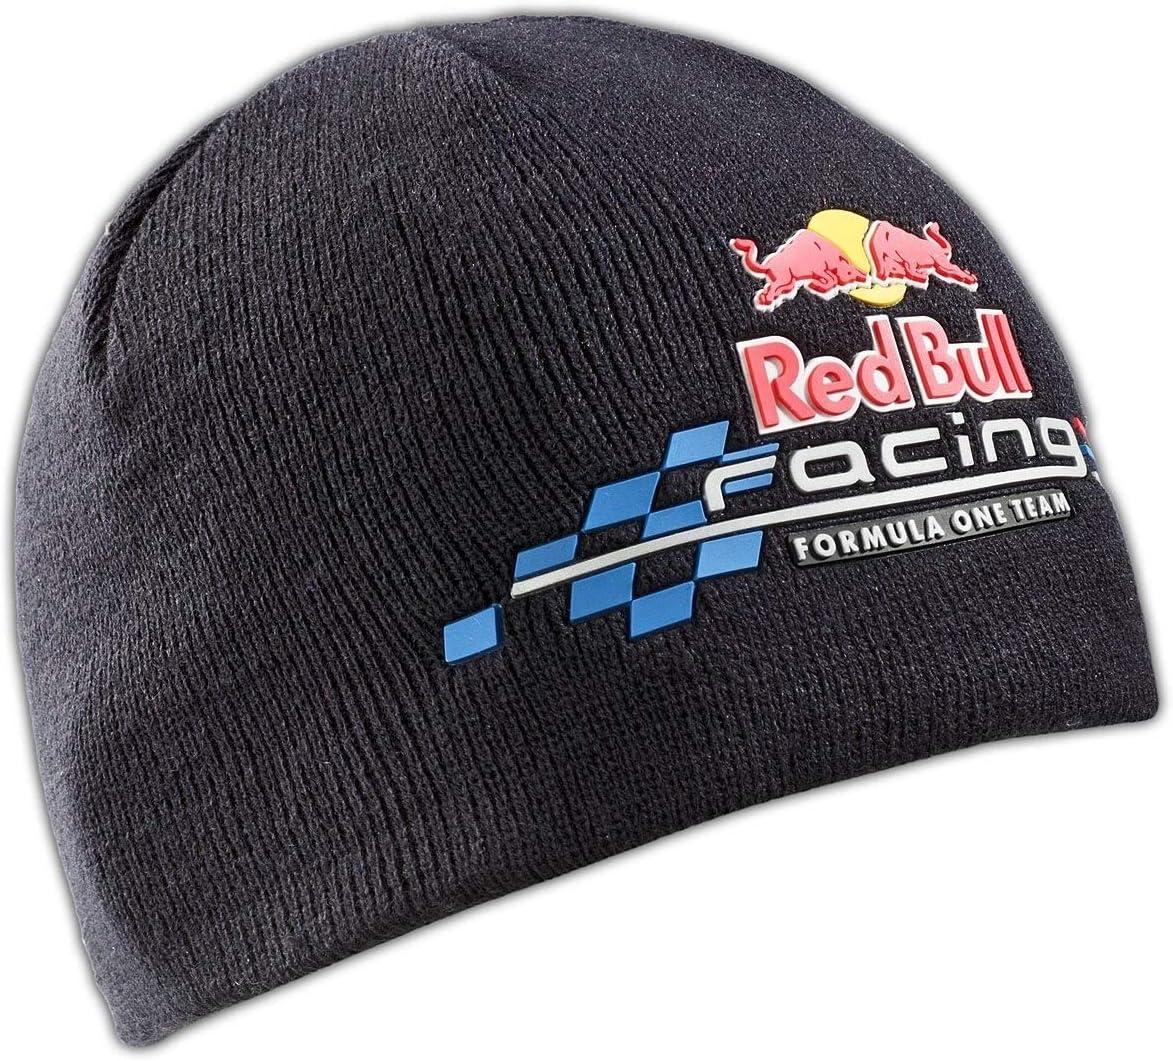 Red Bull Racing fórmula un equipo F1 patrocinador Pepe Jeans azul ...